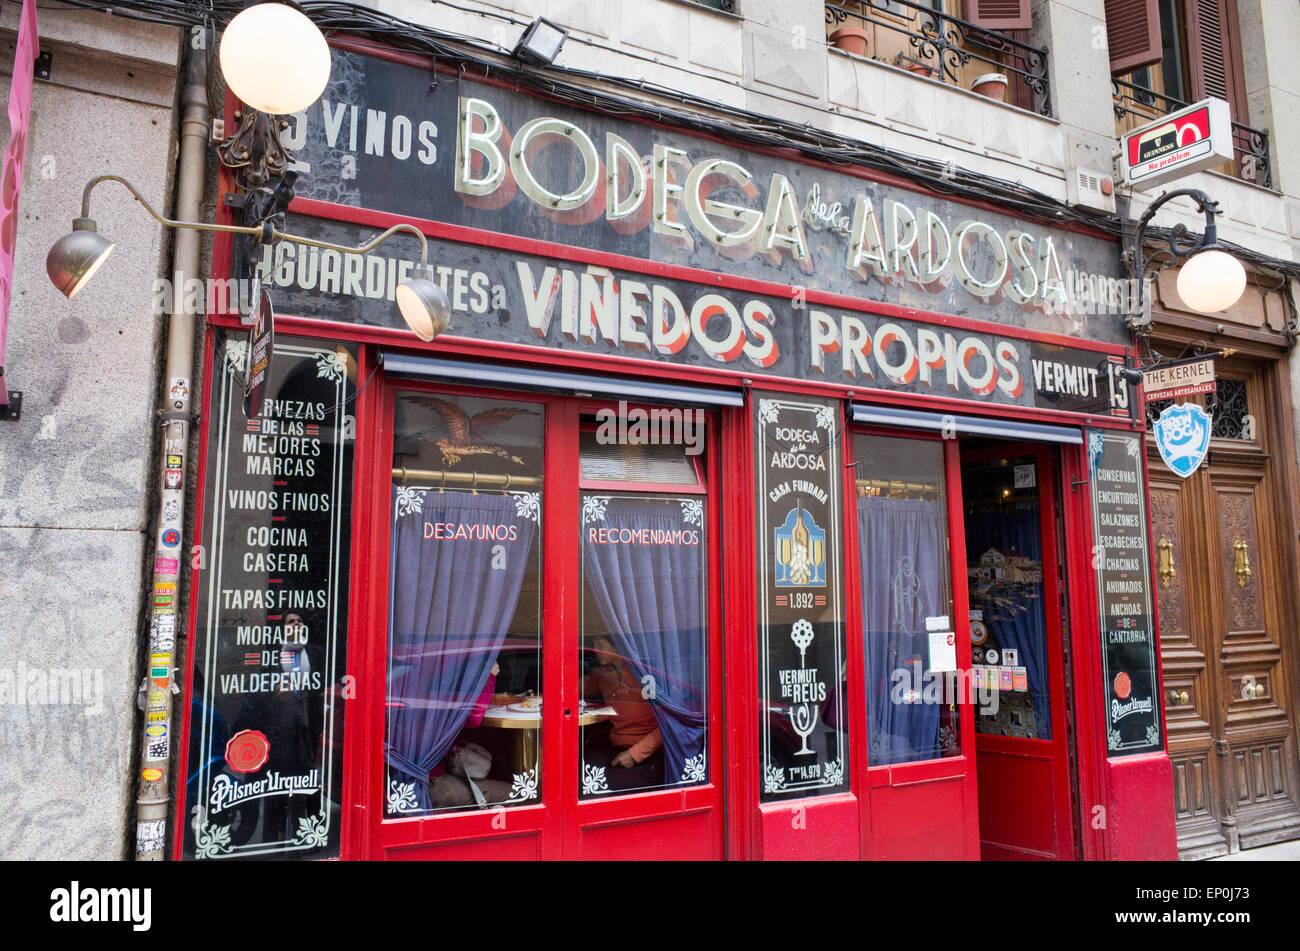 Bodega De La Ardosa In The Malasana District Madrid Spain Stock